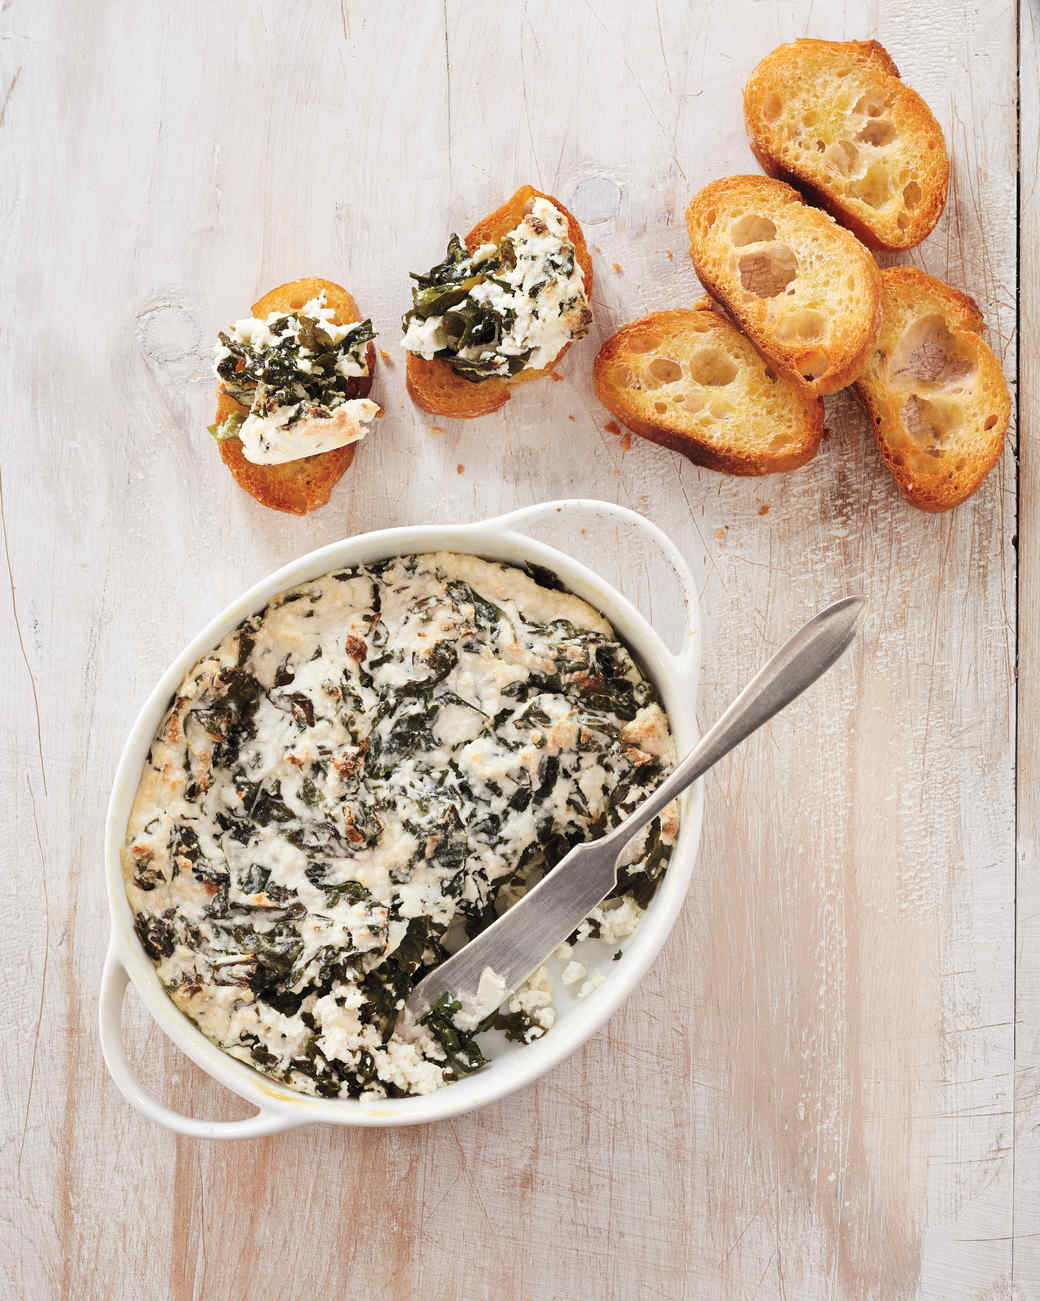 baked-ricotta-and-greens-277-main-d111399.jpg